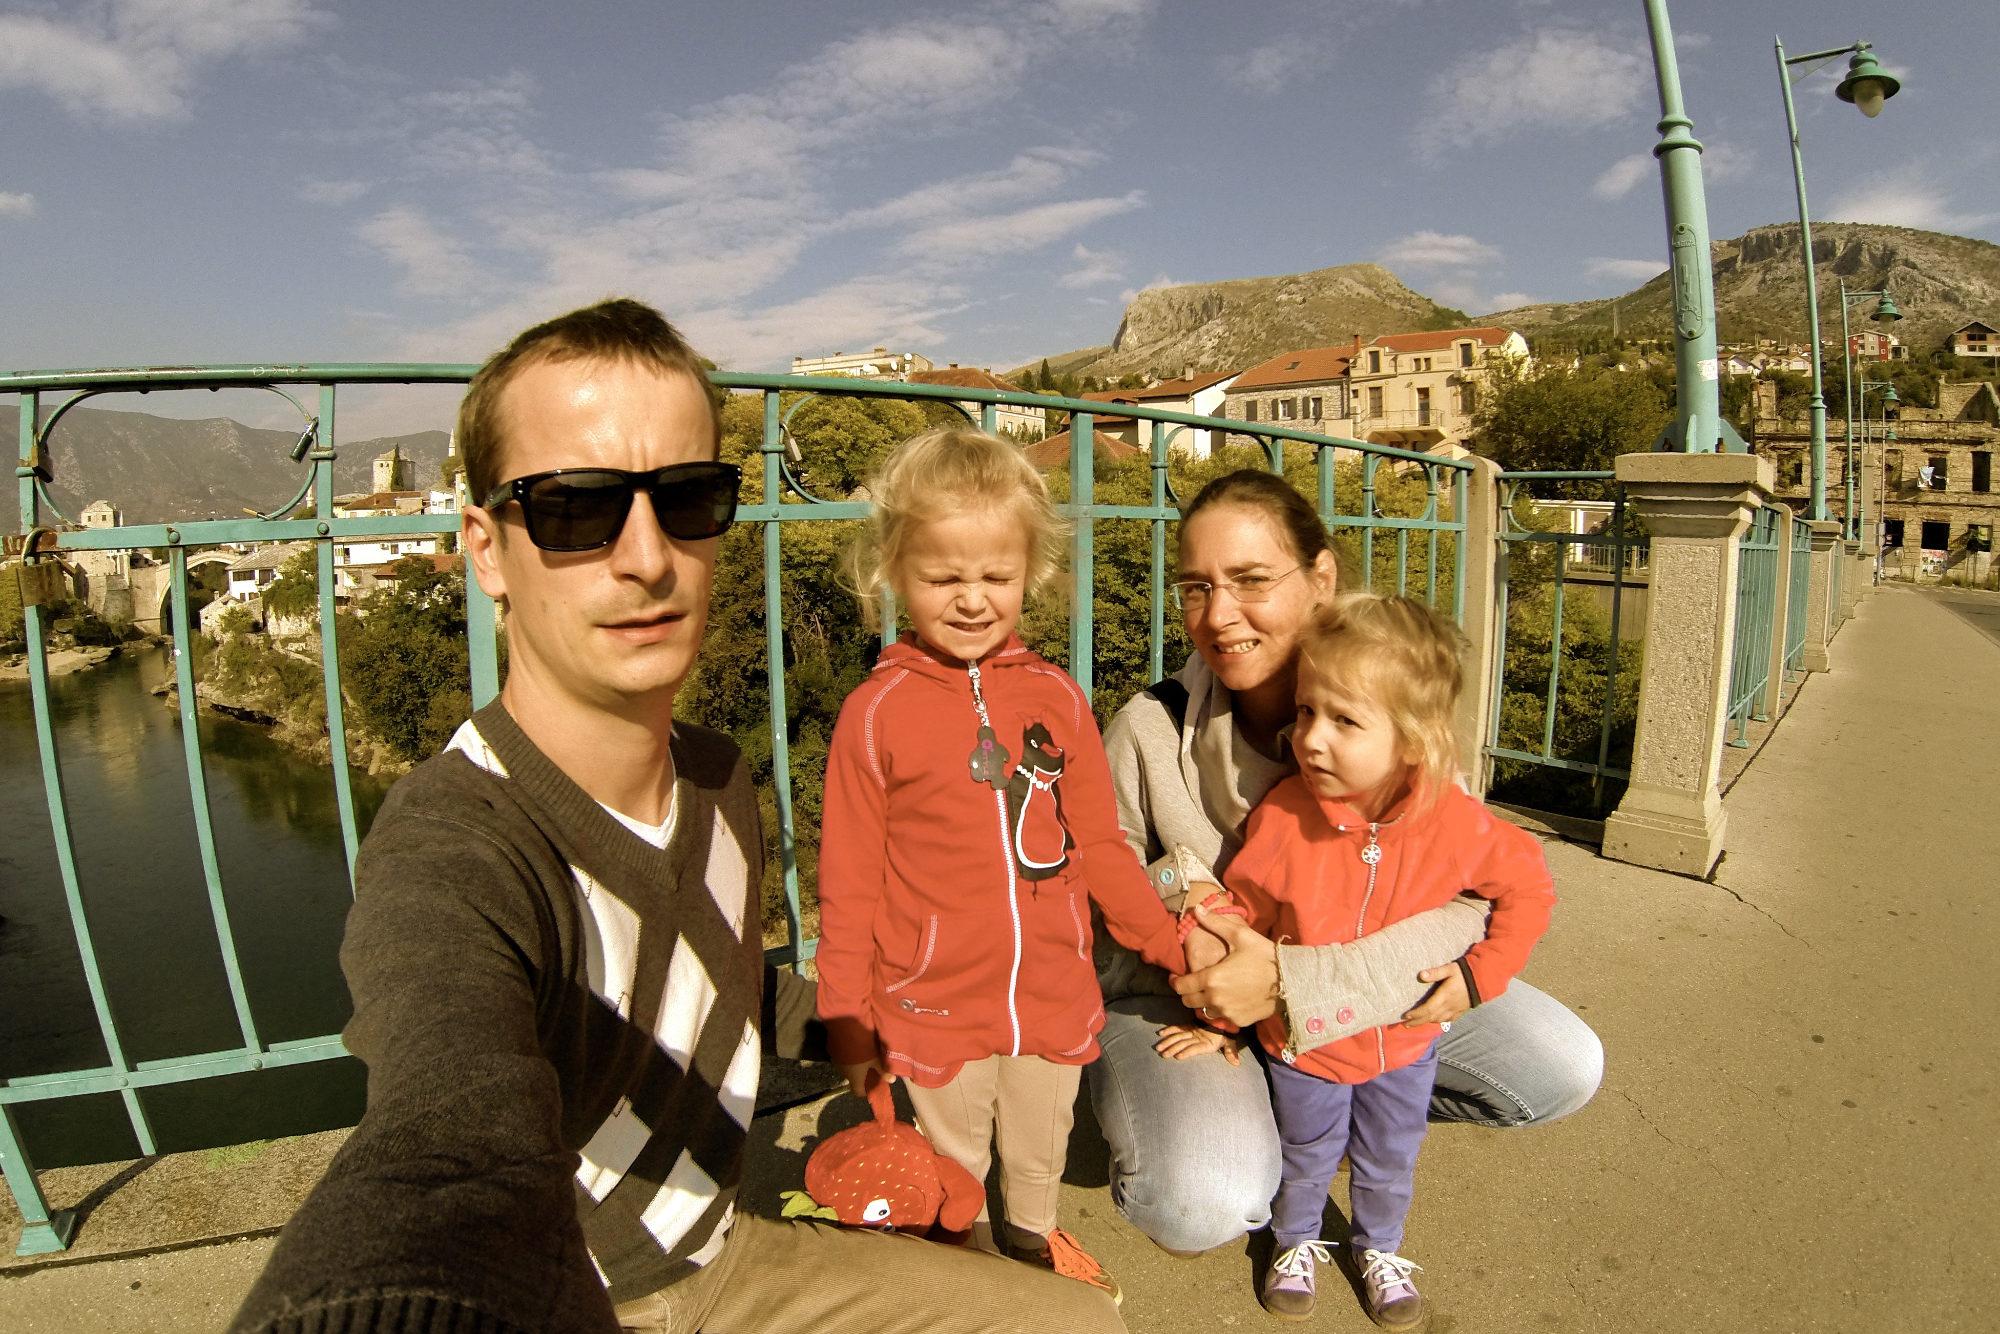 Caravan family in Mostar